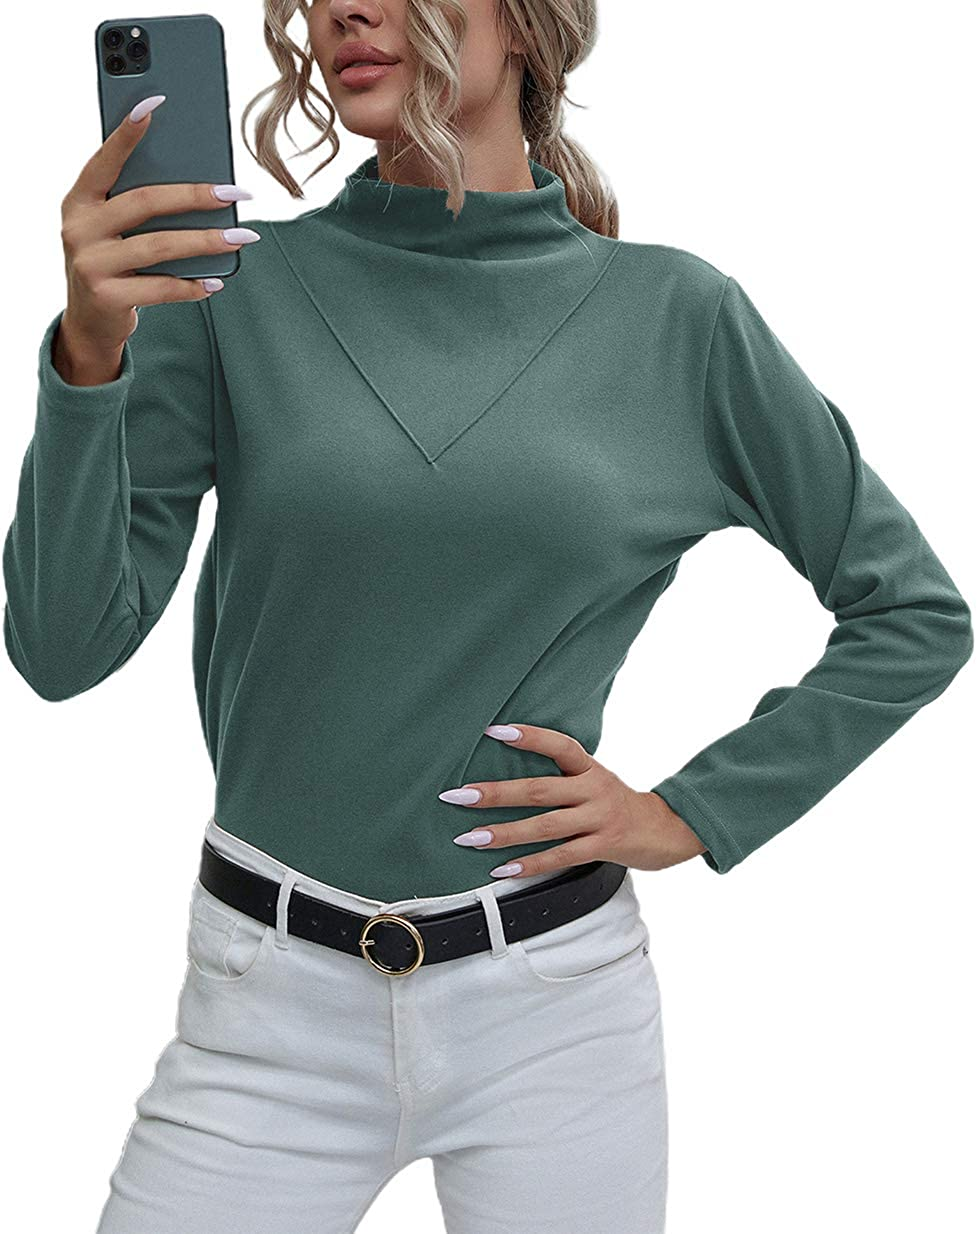 chouyatou Women's Comfy Brushed Mock Neck Pullover Thermal Layer Shirt Undershirt